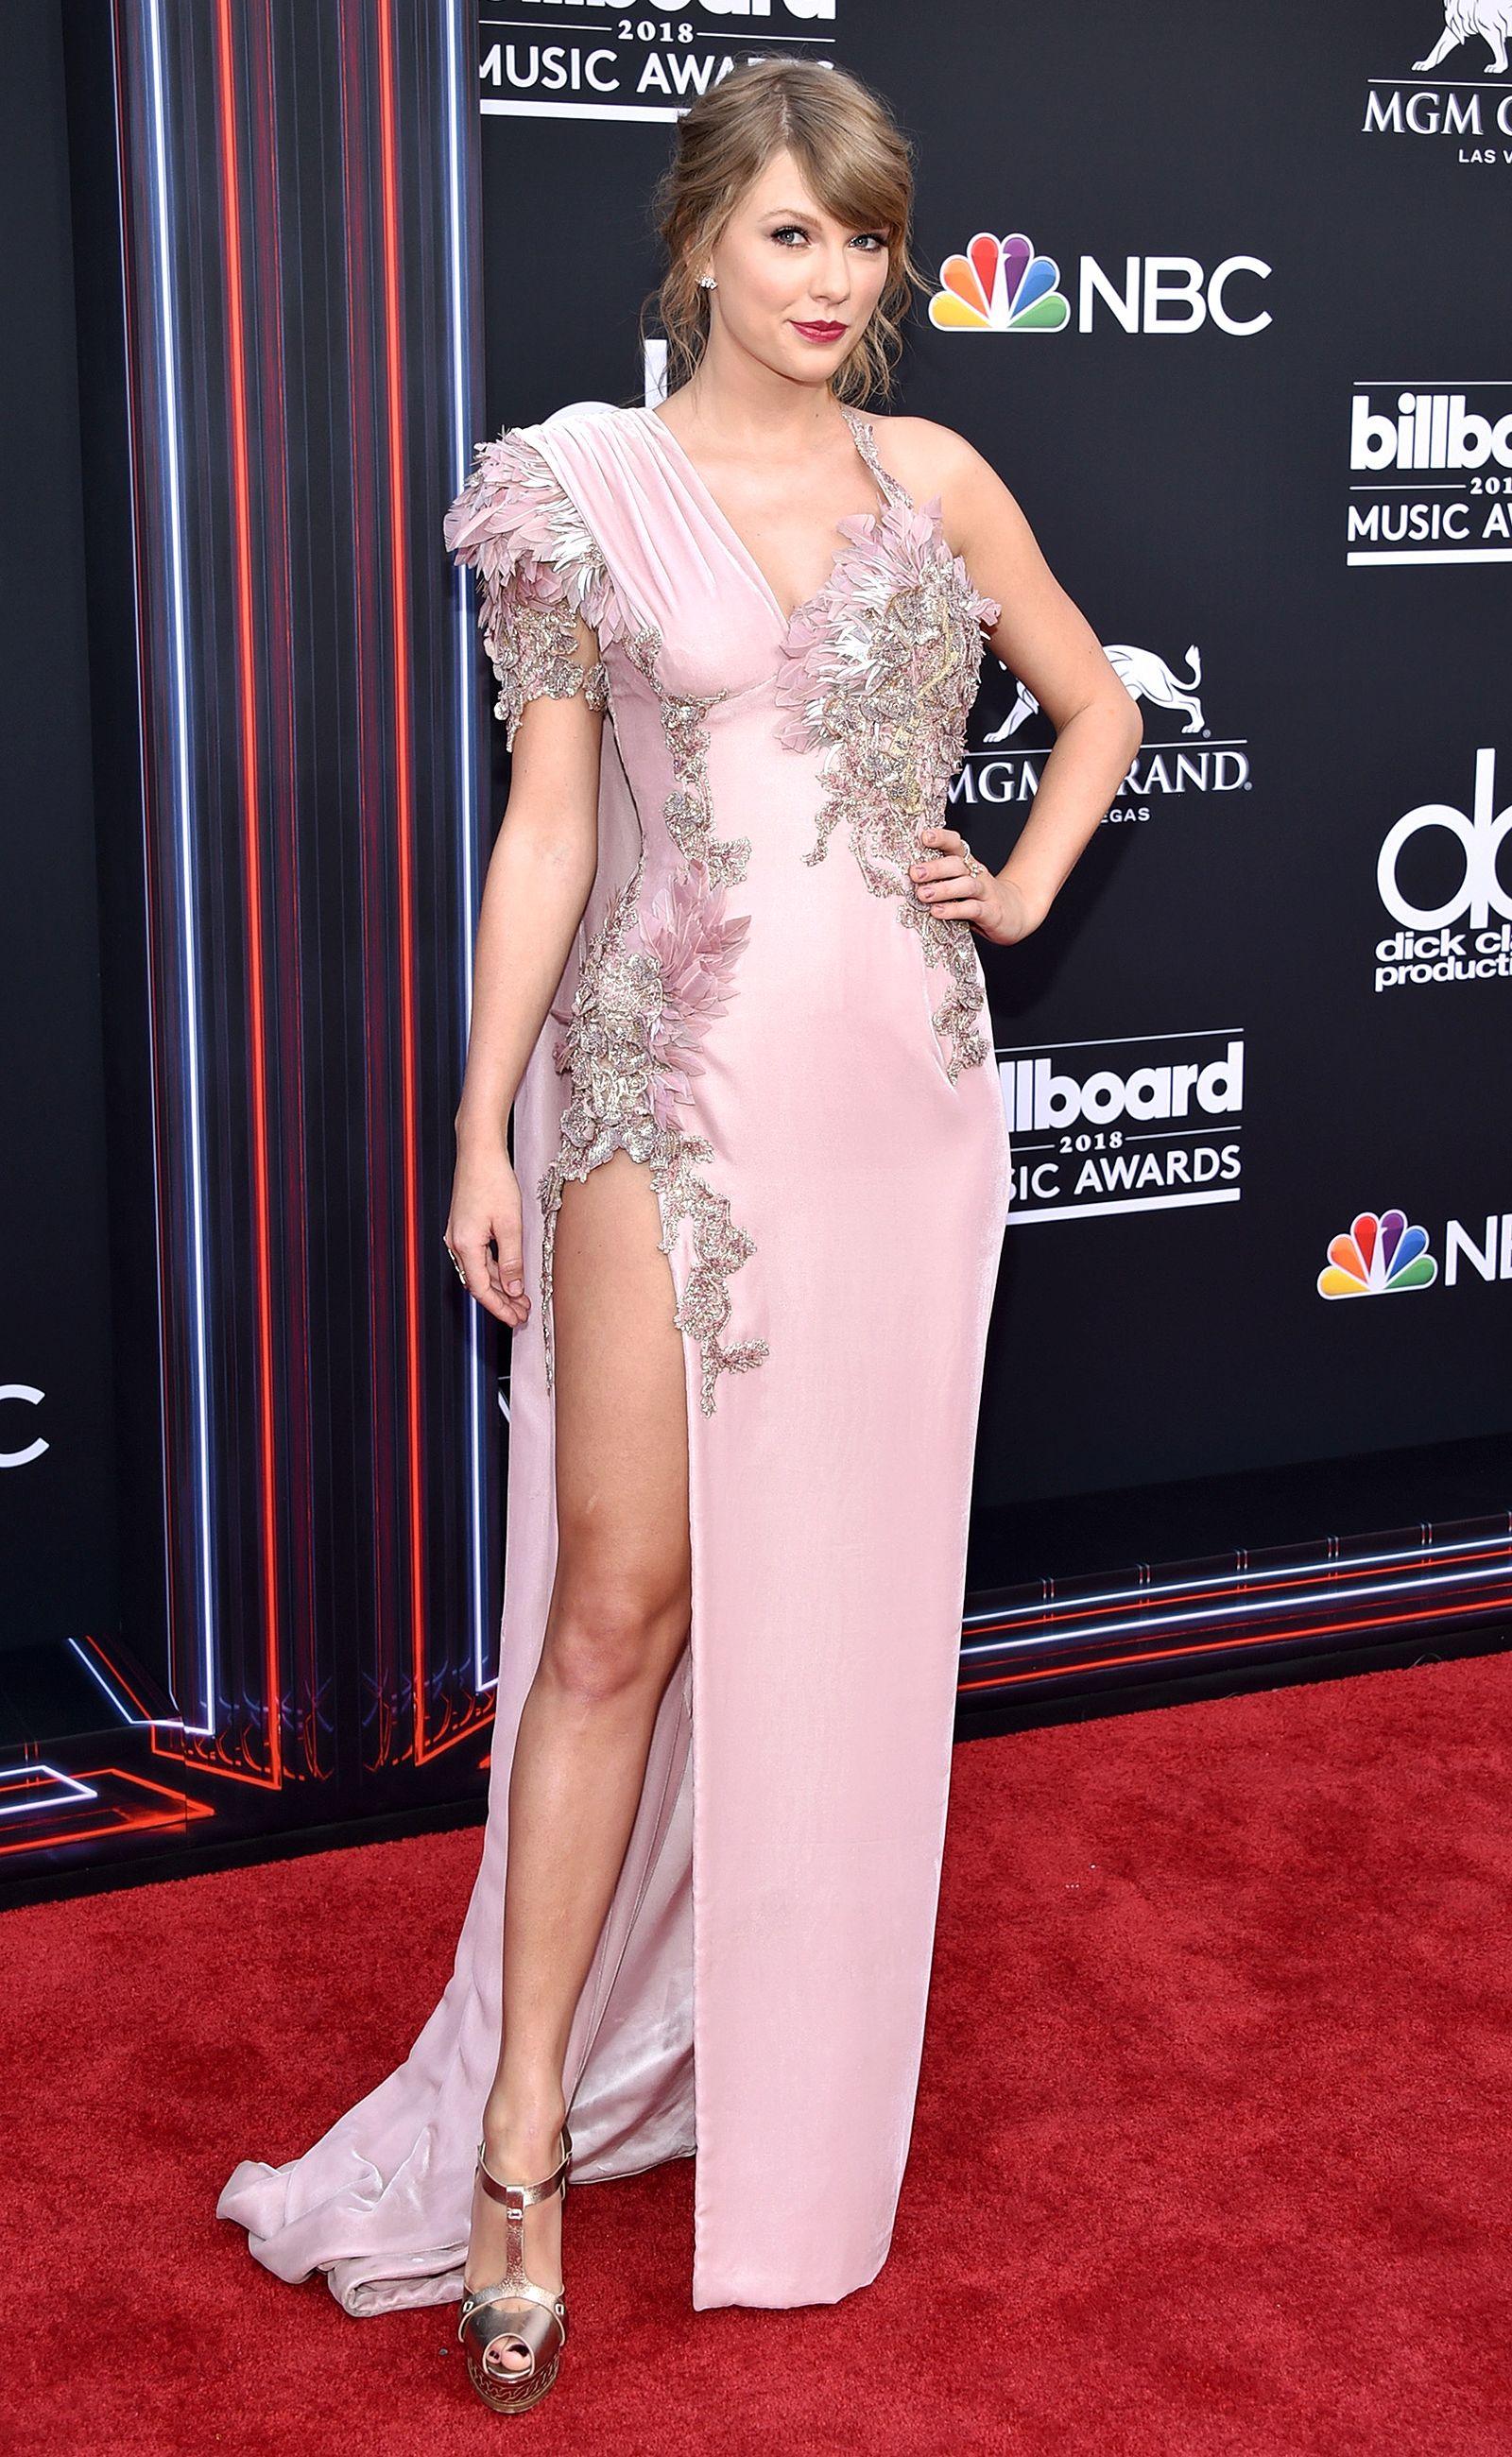 Billboard Music Awards 2018 Arrivals: All the Photos | Vestiditos